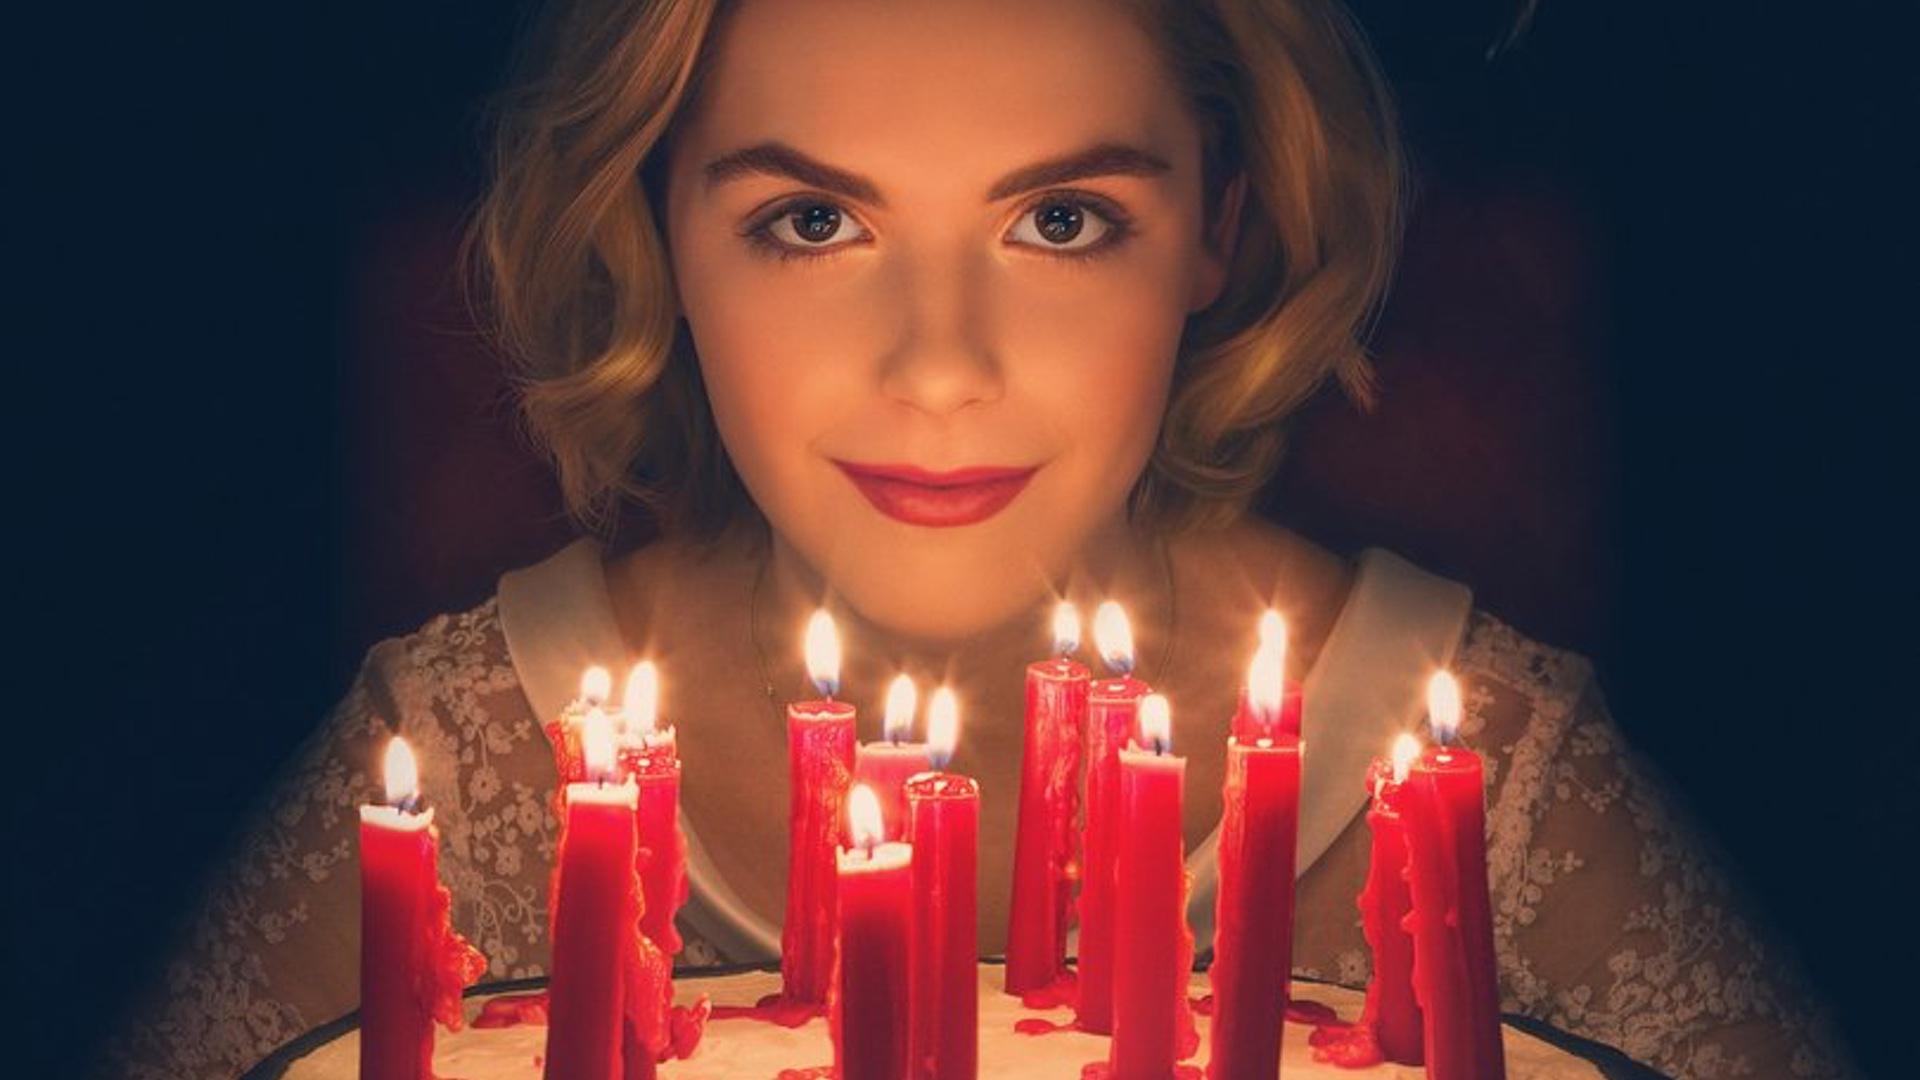 Les Nouvelles Aventures De Sabrina Netflix Balance Un